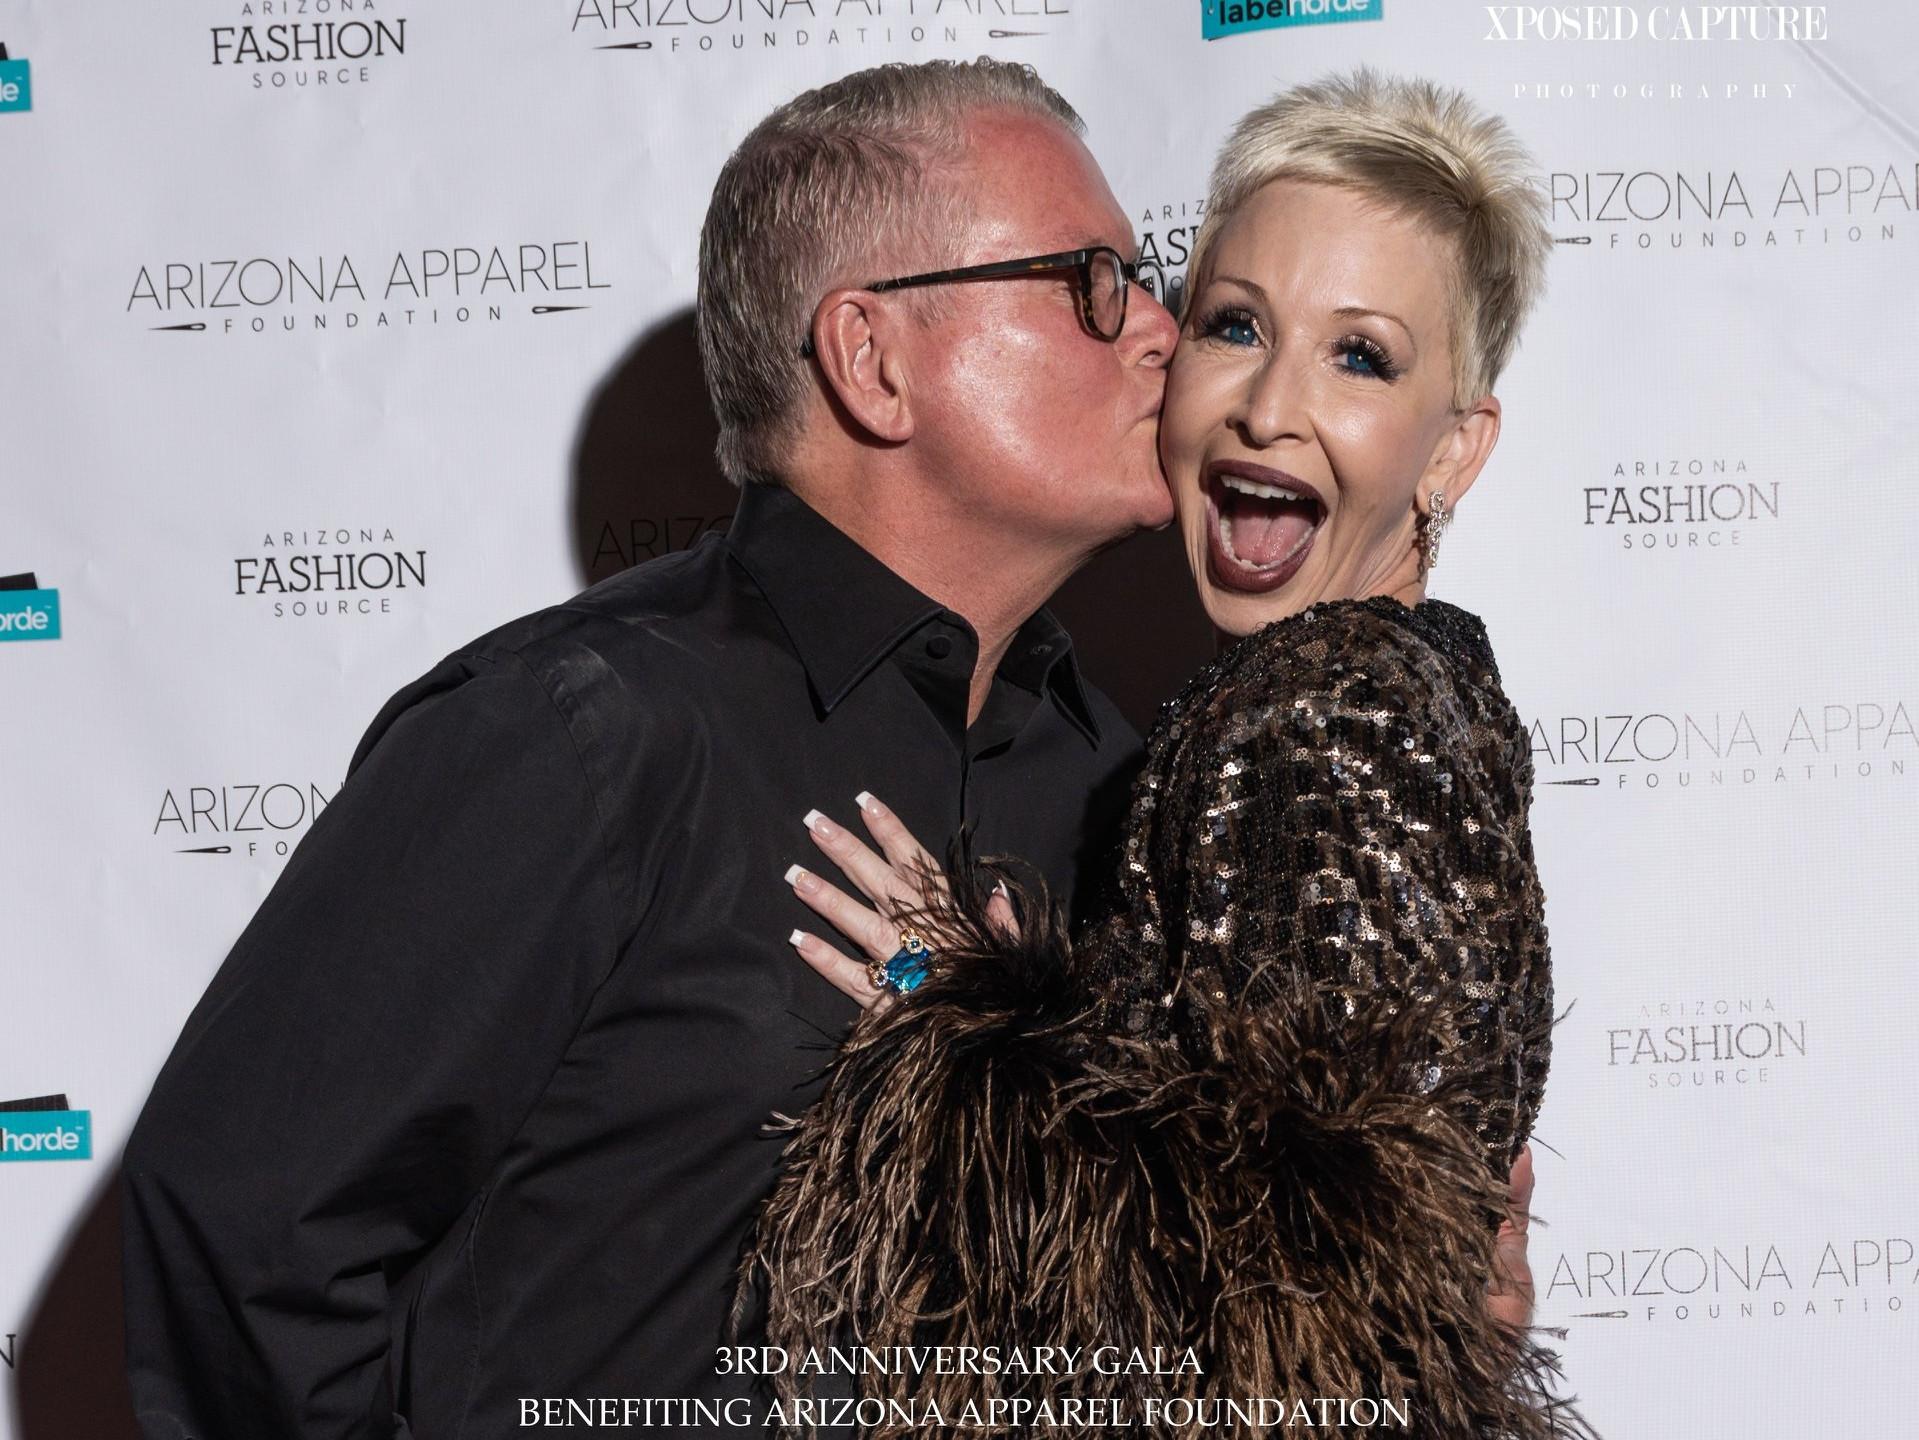 Bert and Camerone kiss